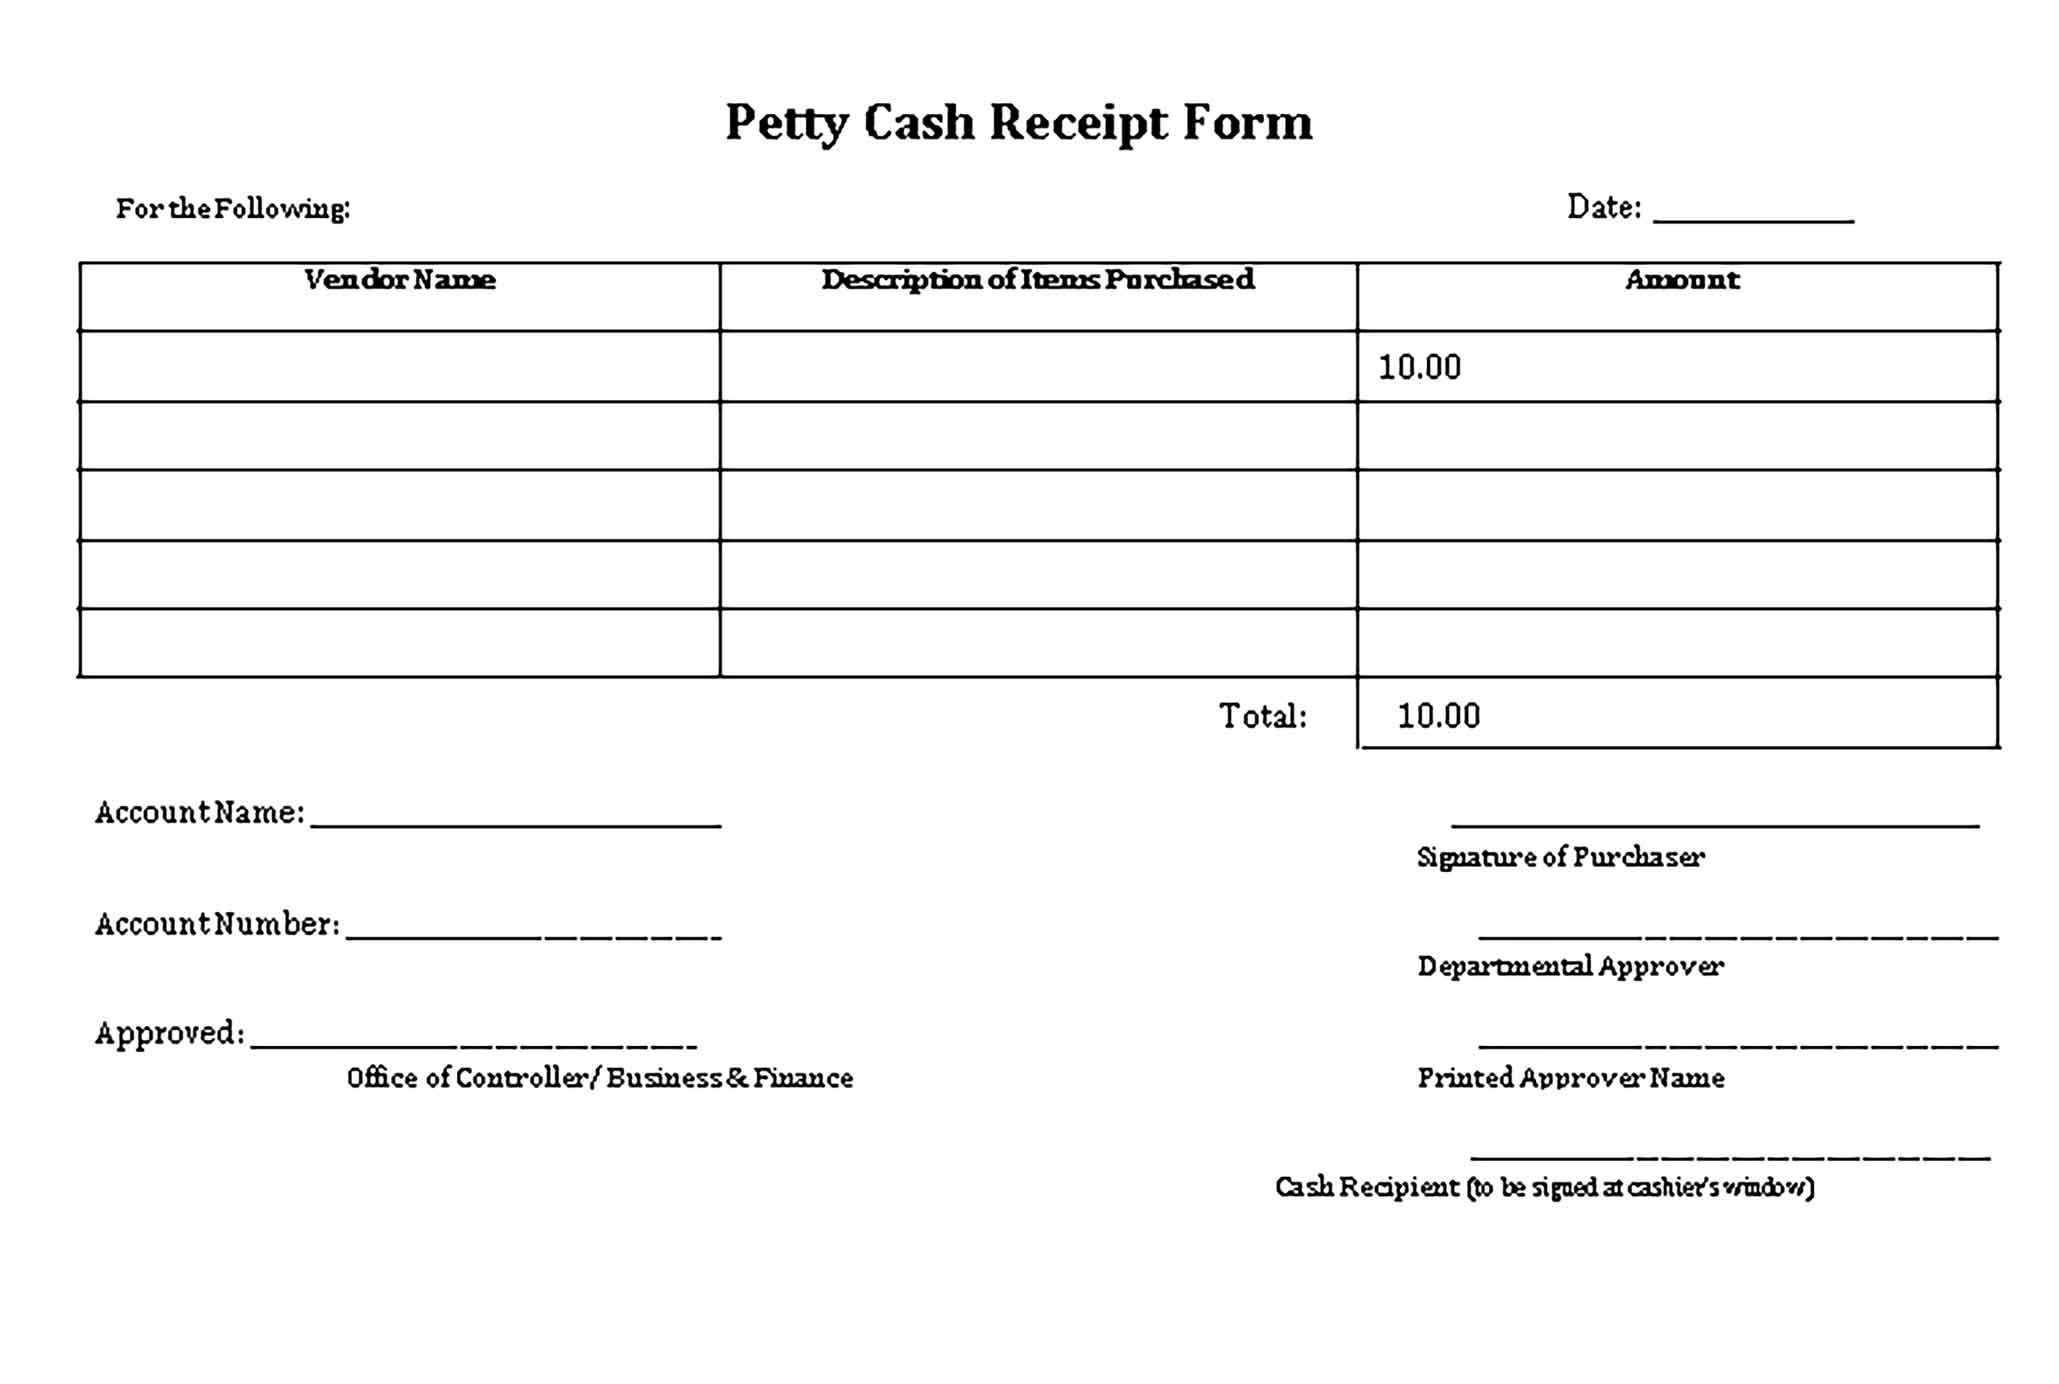 Sample Petty Cash Receipt Receipt Template Business Template Templates Petty cash receipt template free